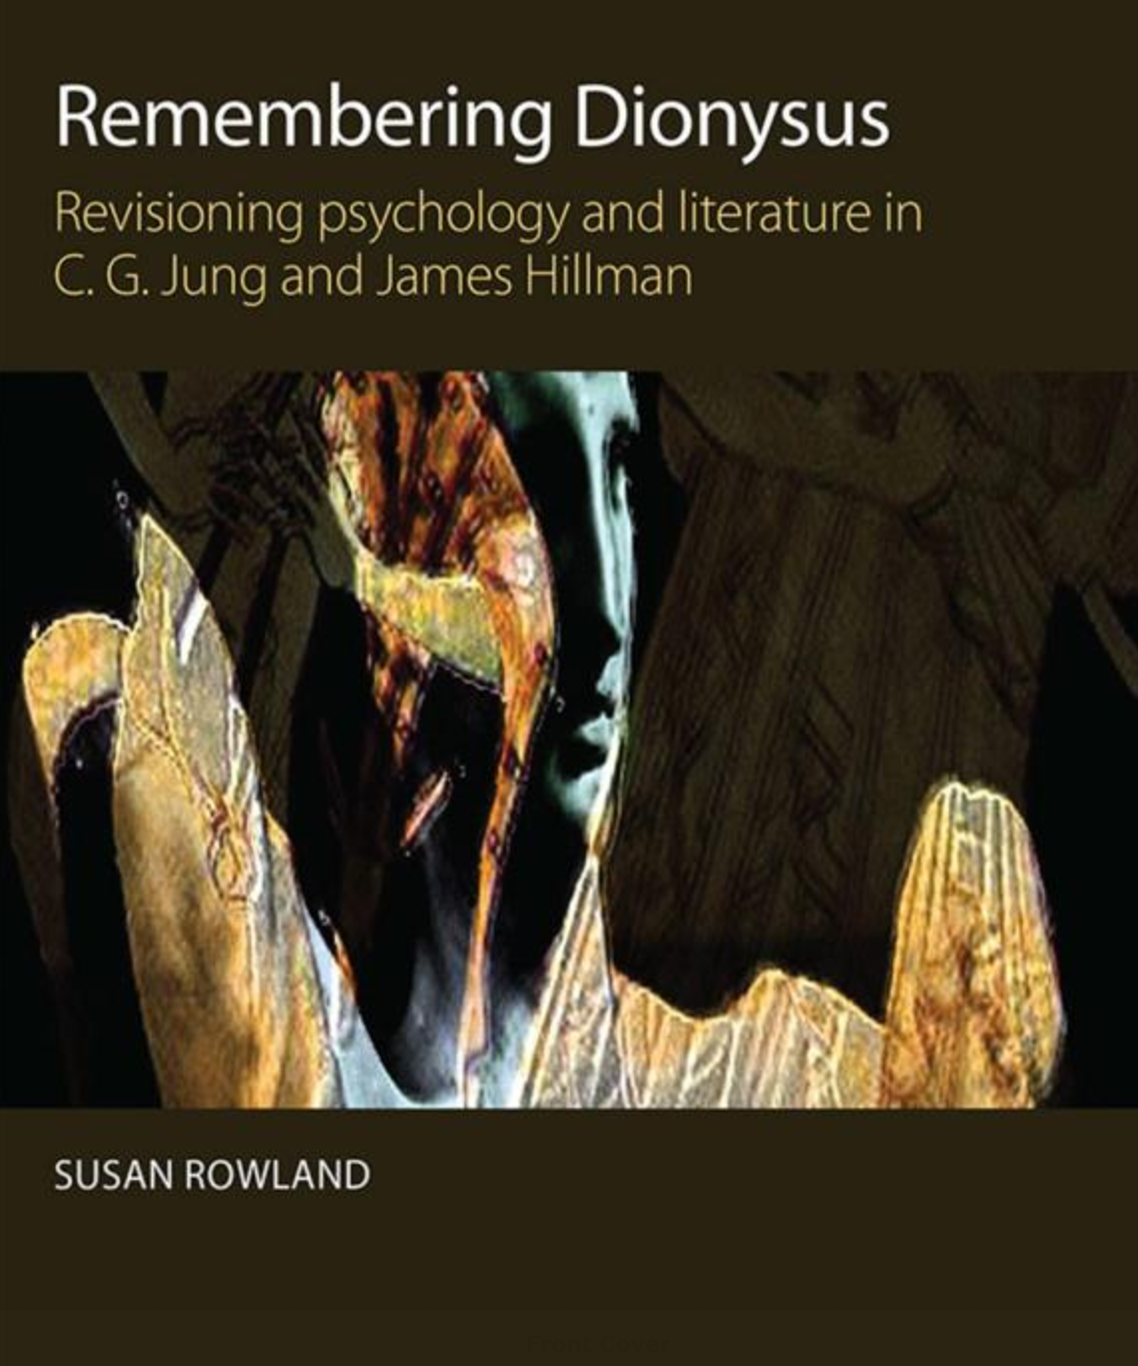 book-rowland-remembering-dionysus.png